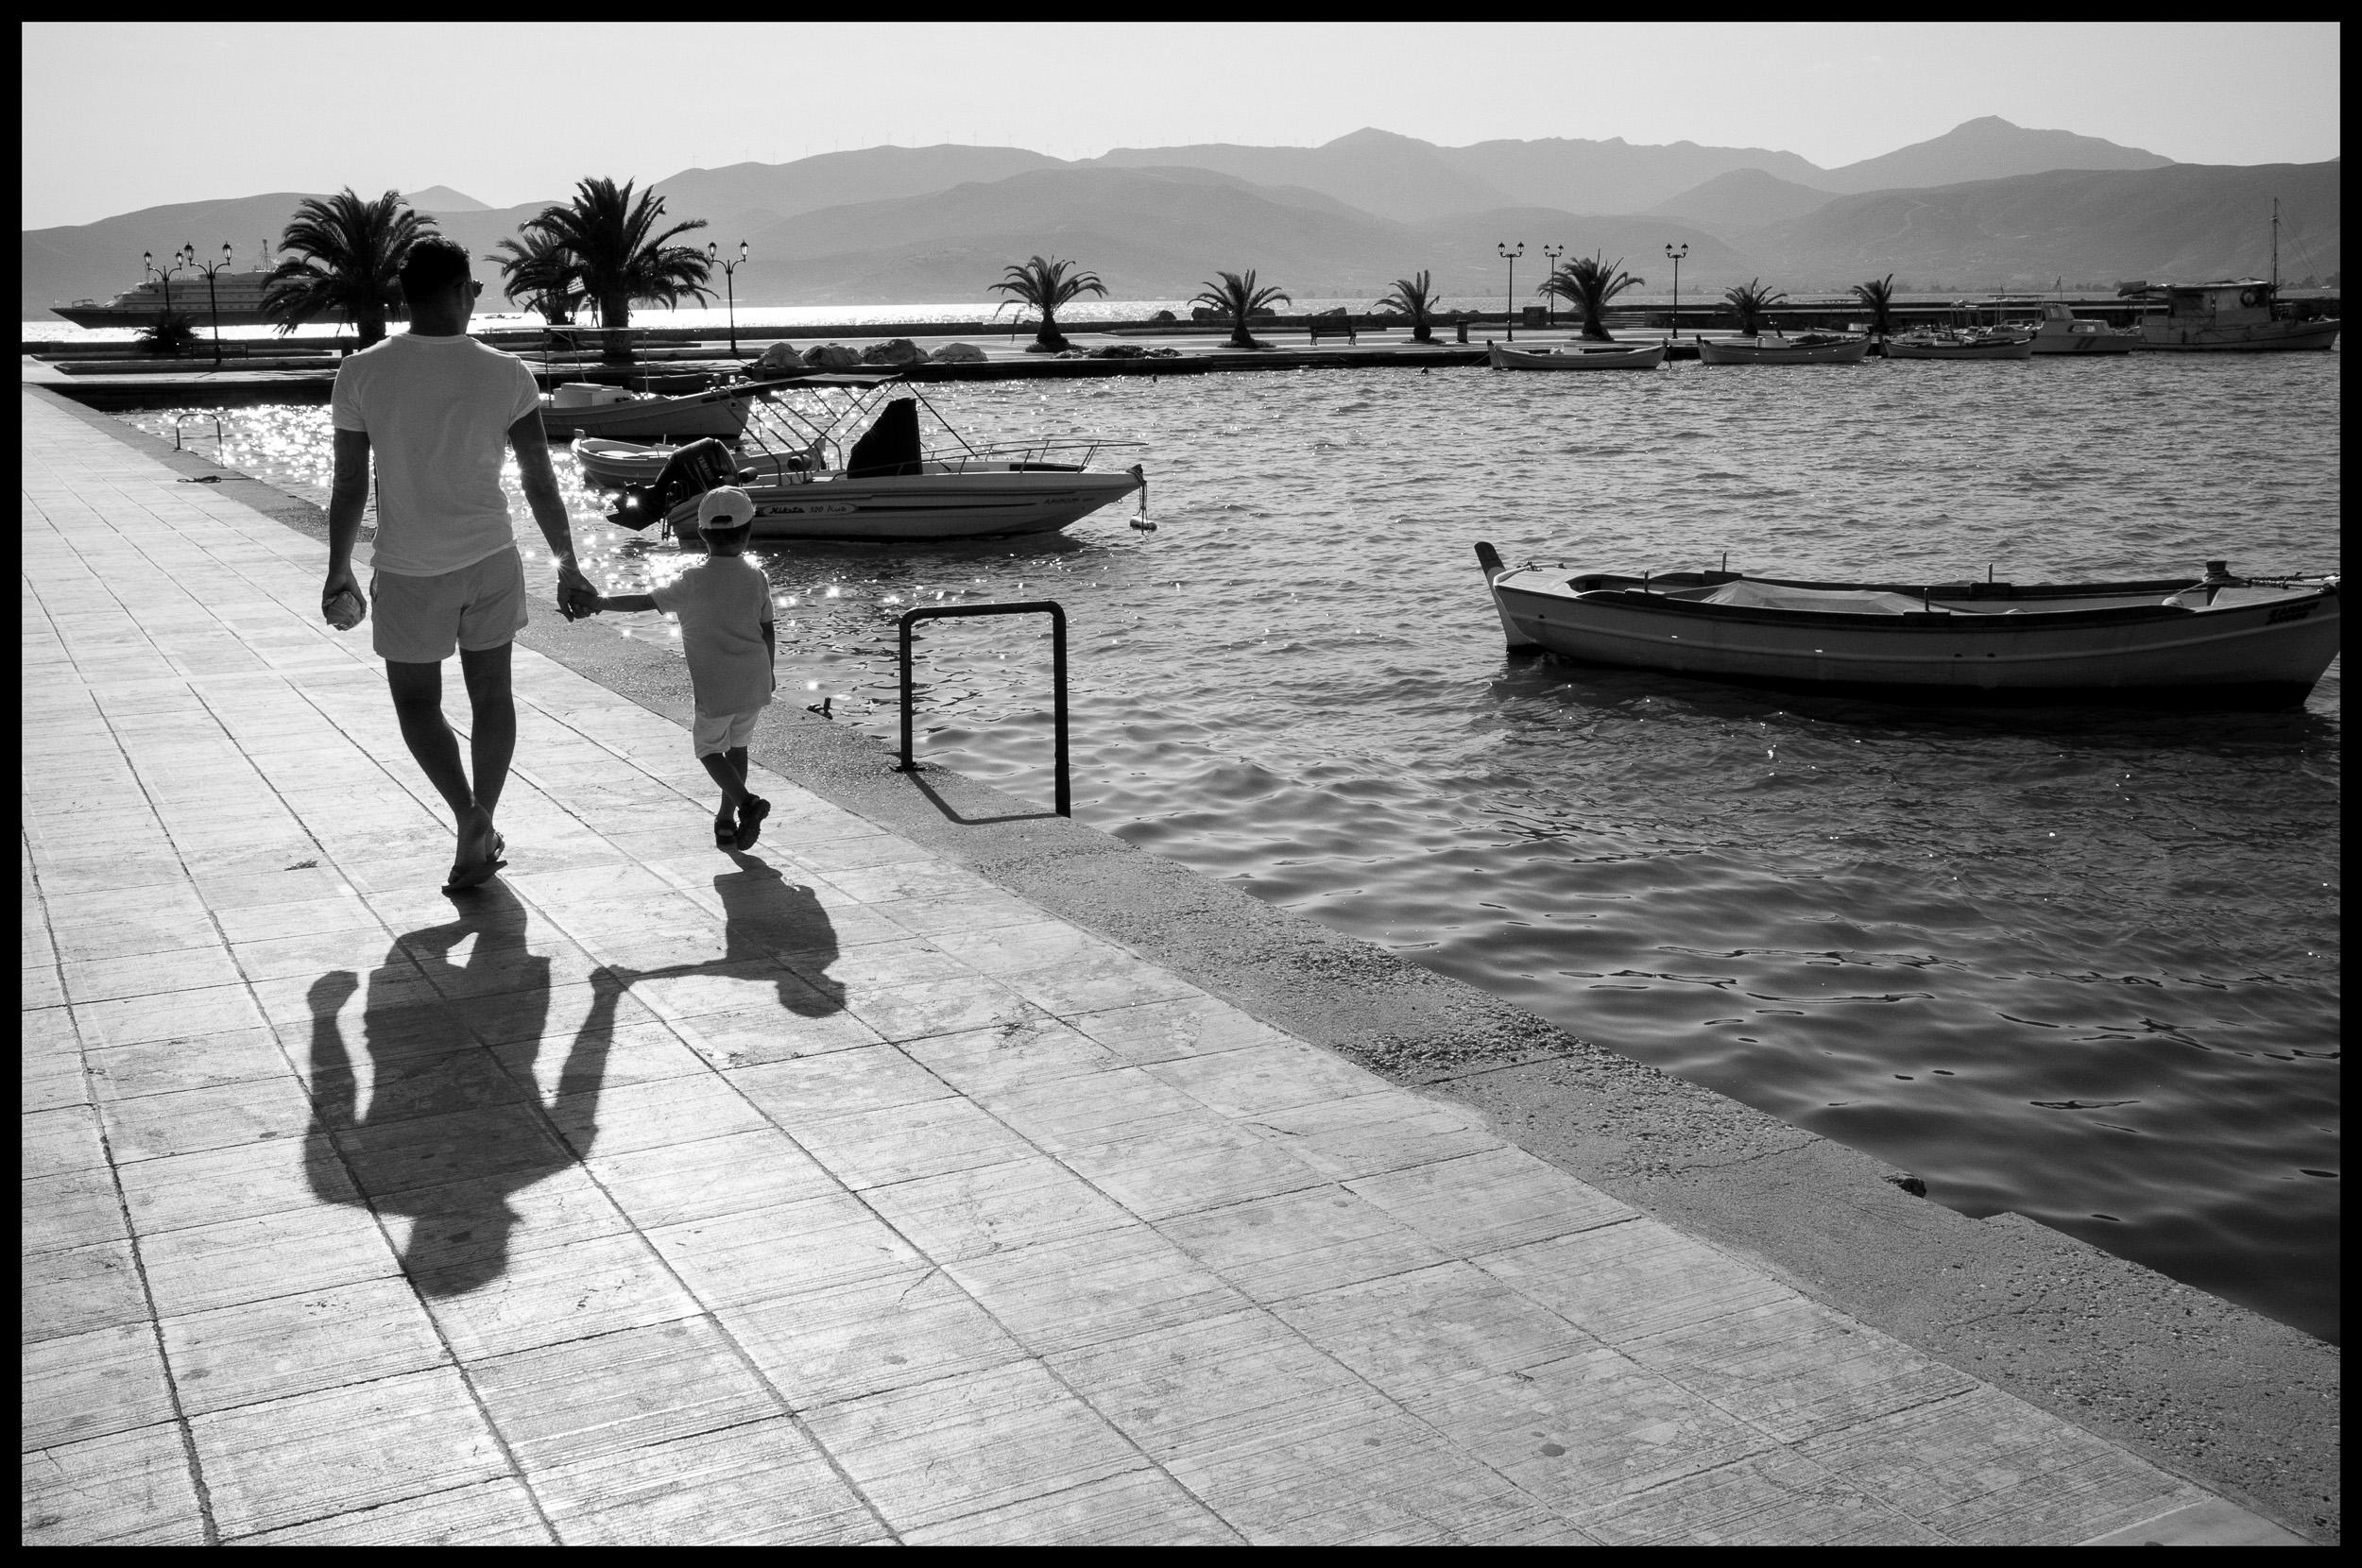 RO_Greece_5490.jpg